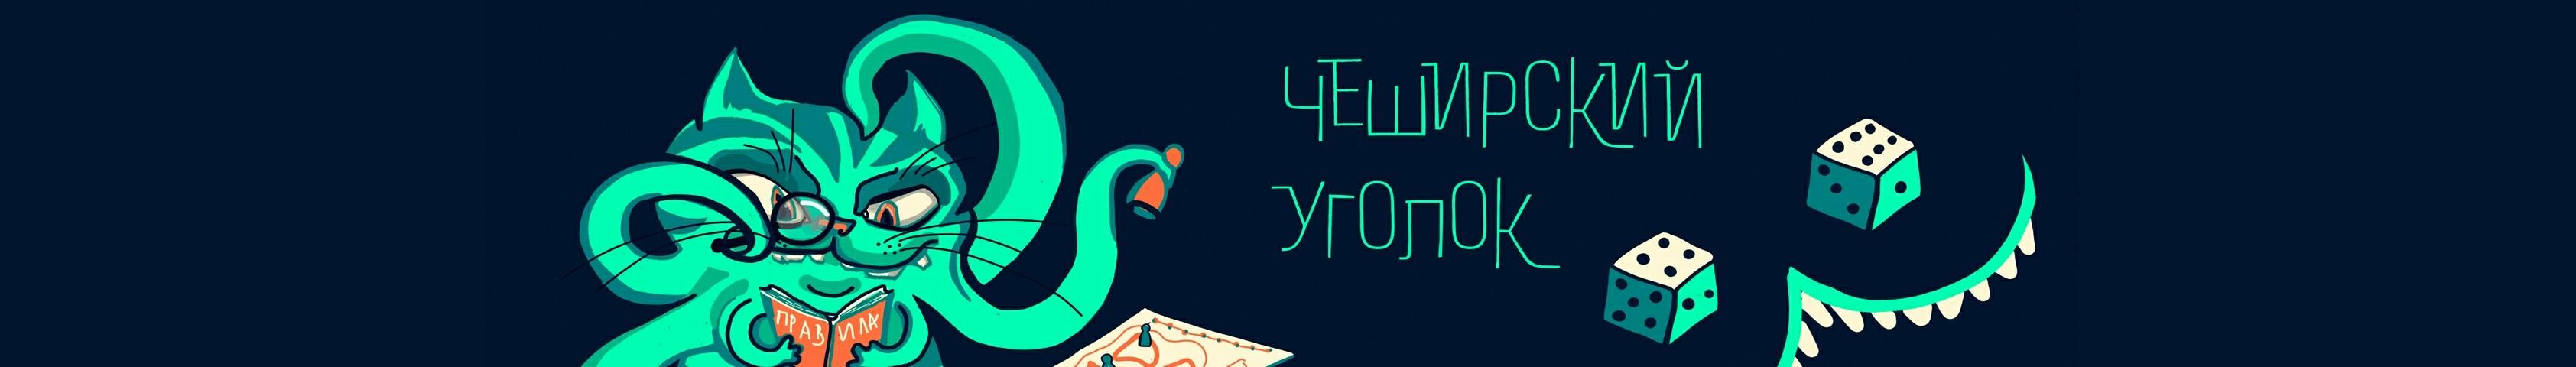 creator cover Чеширский Уголок